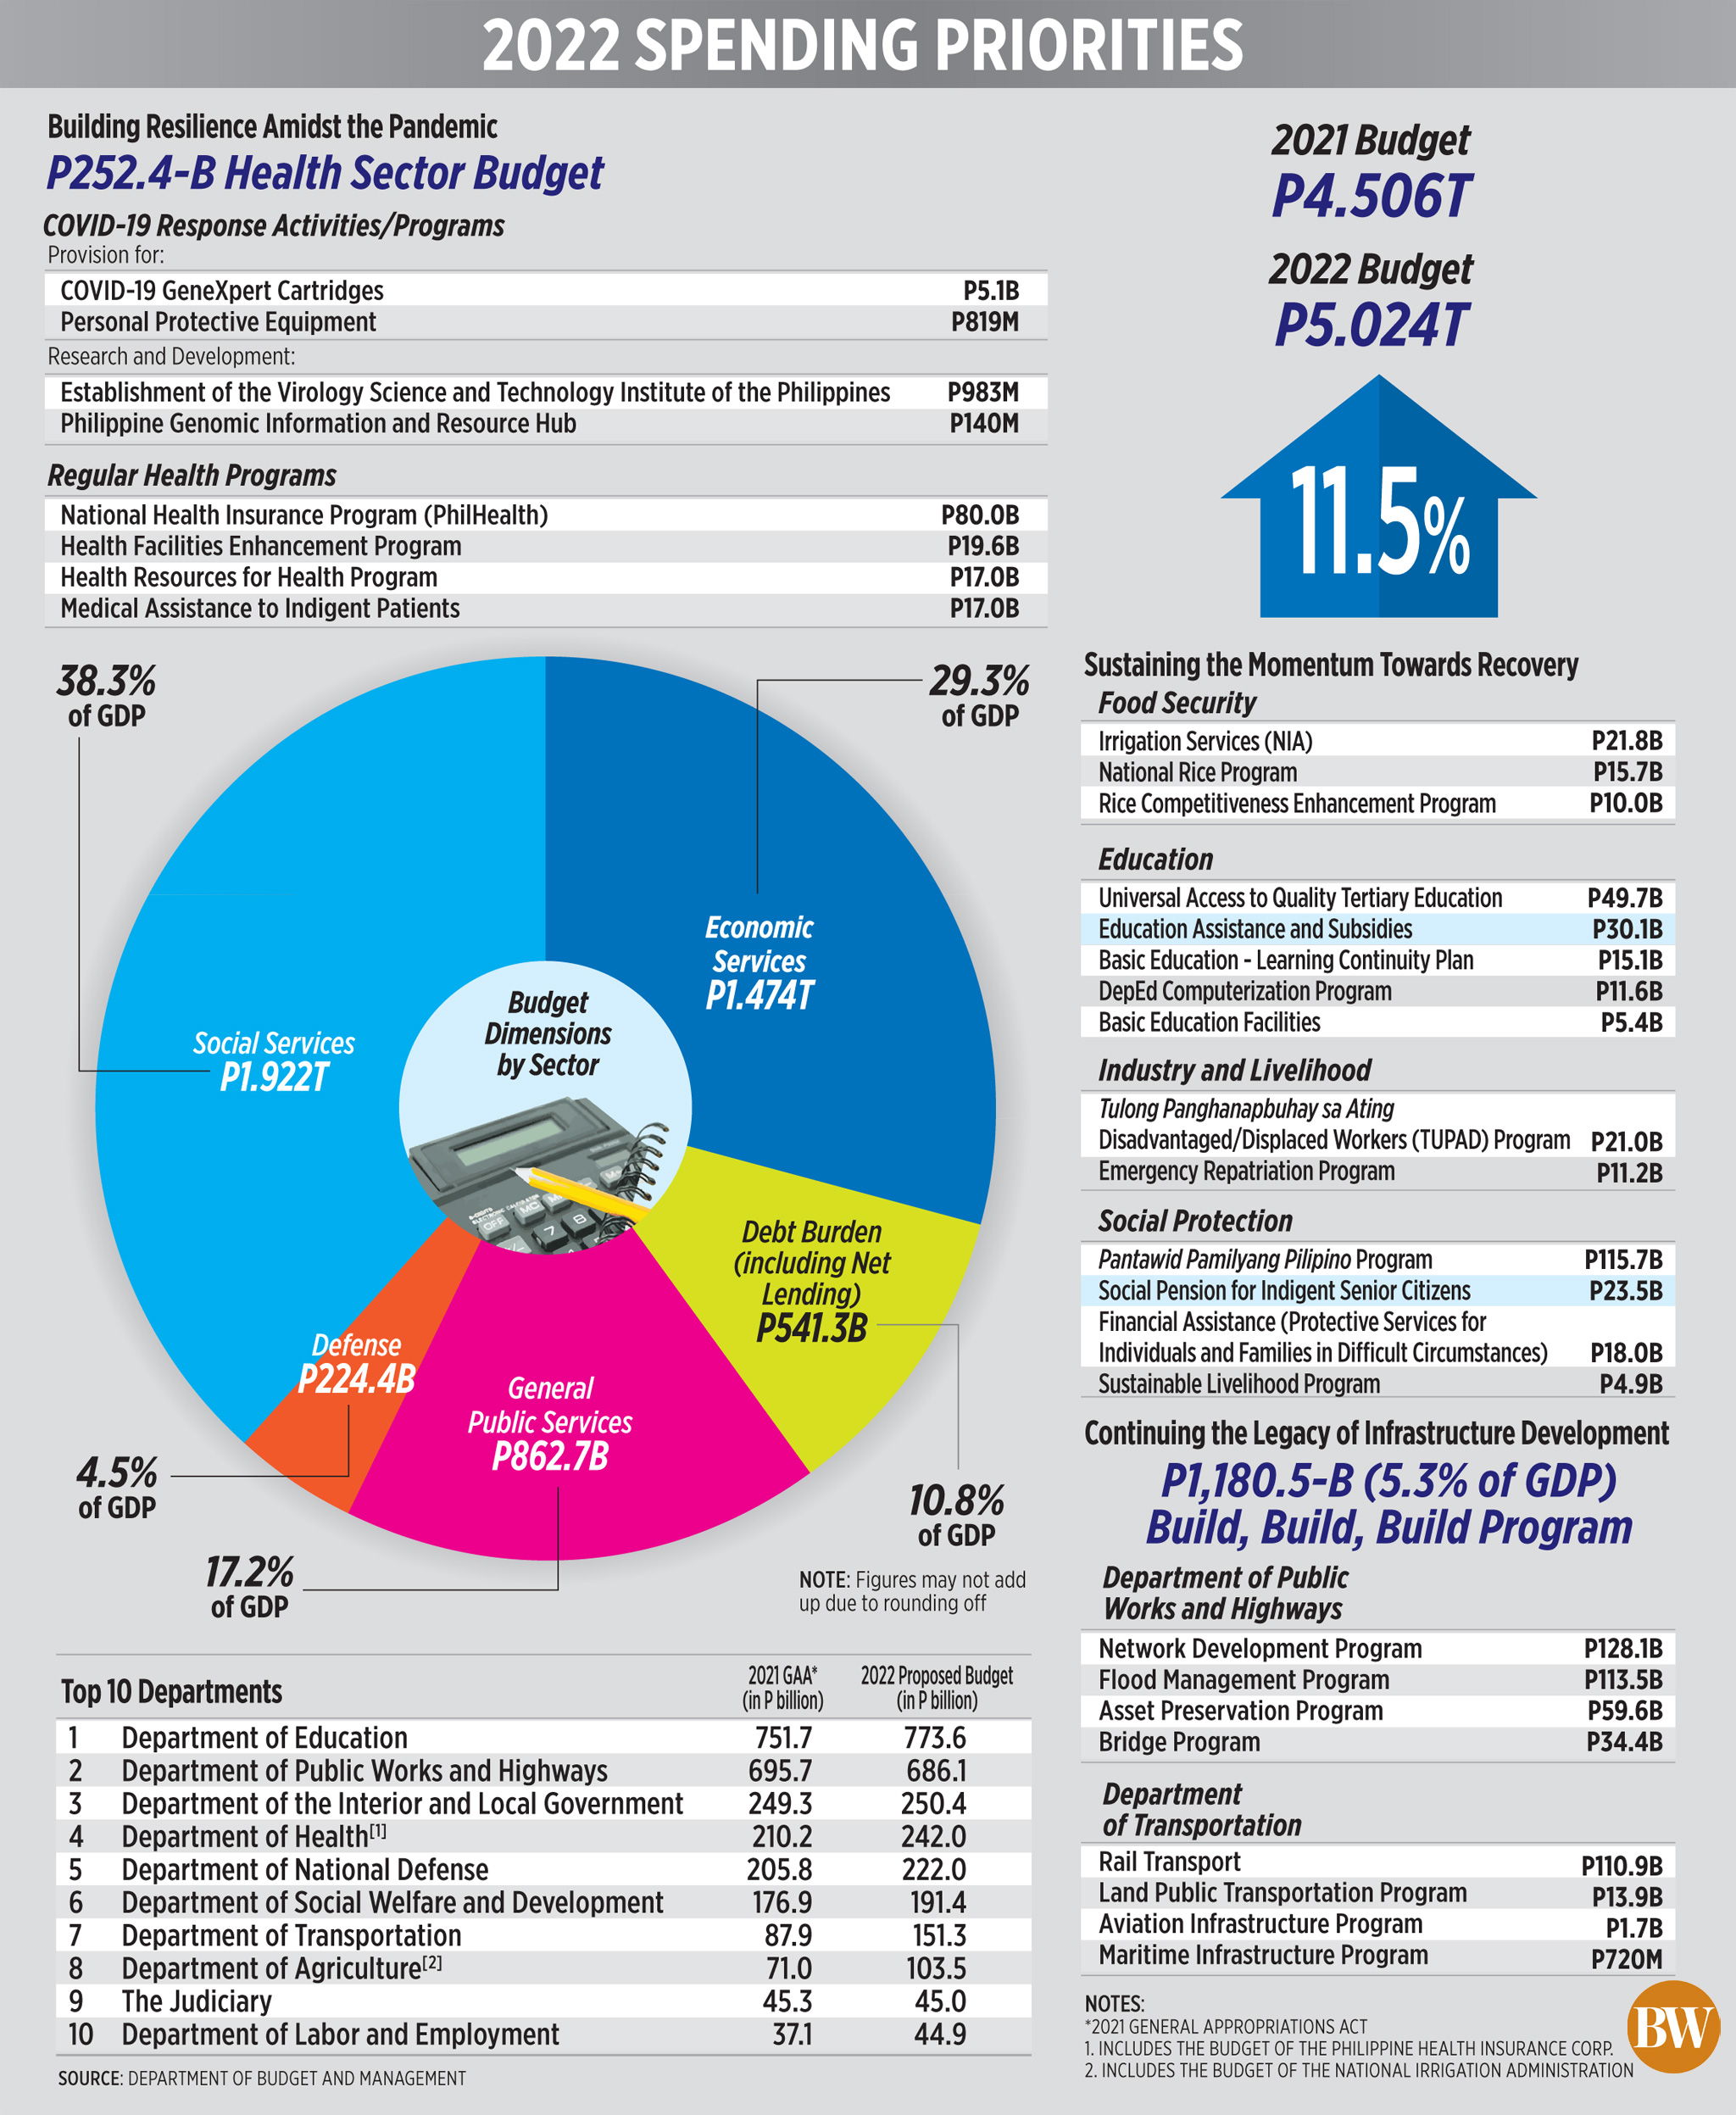 2022 Spending priorities